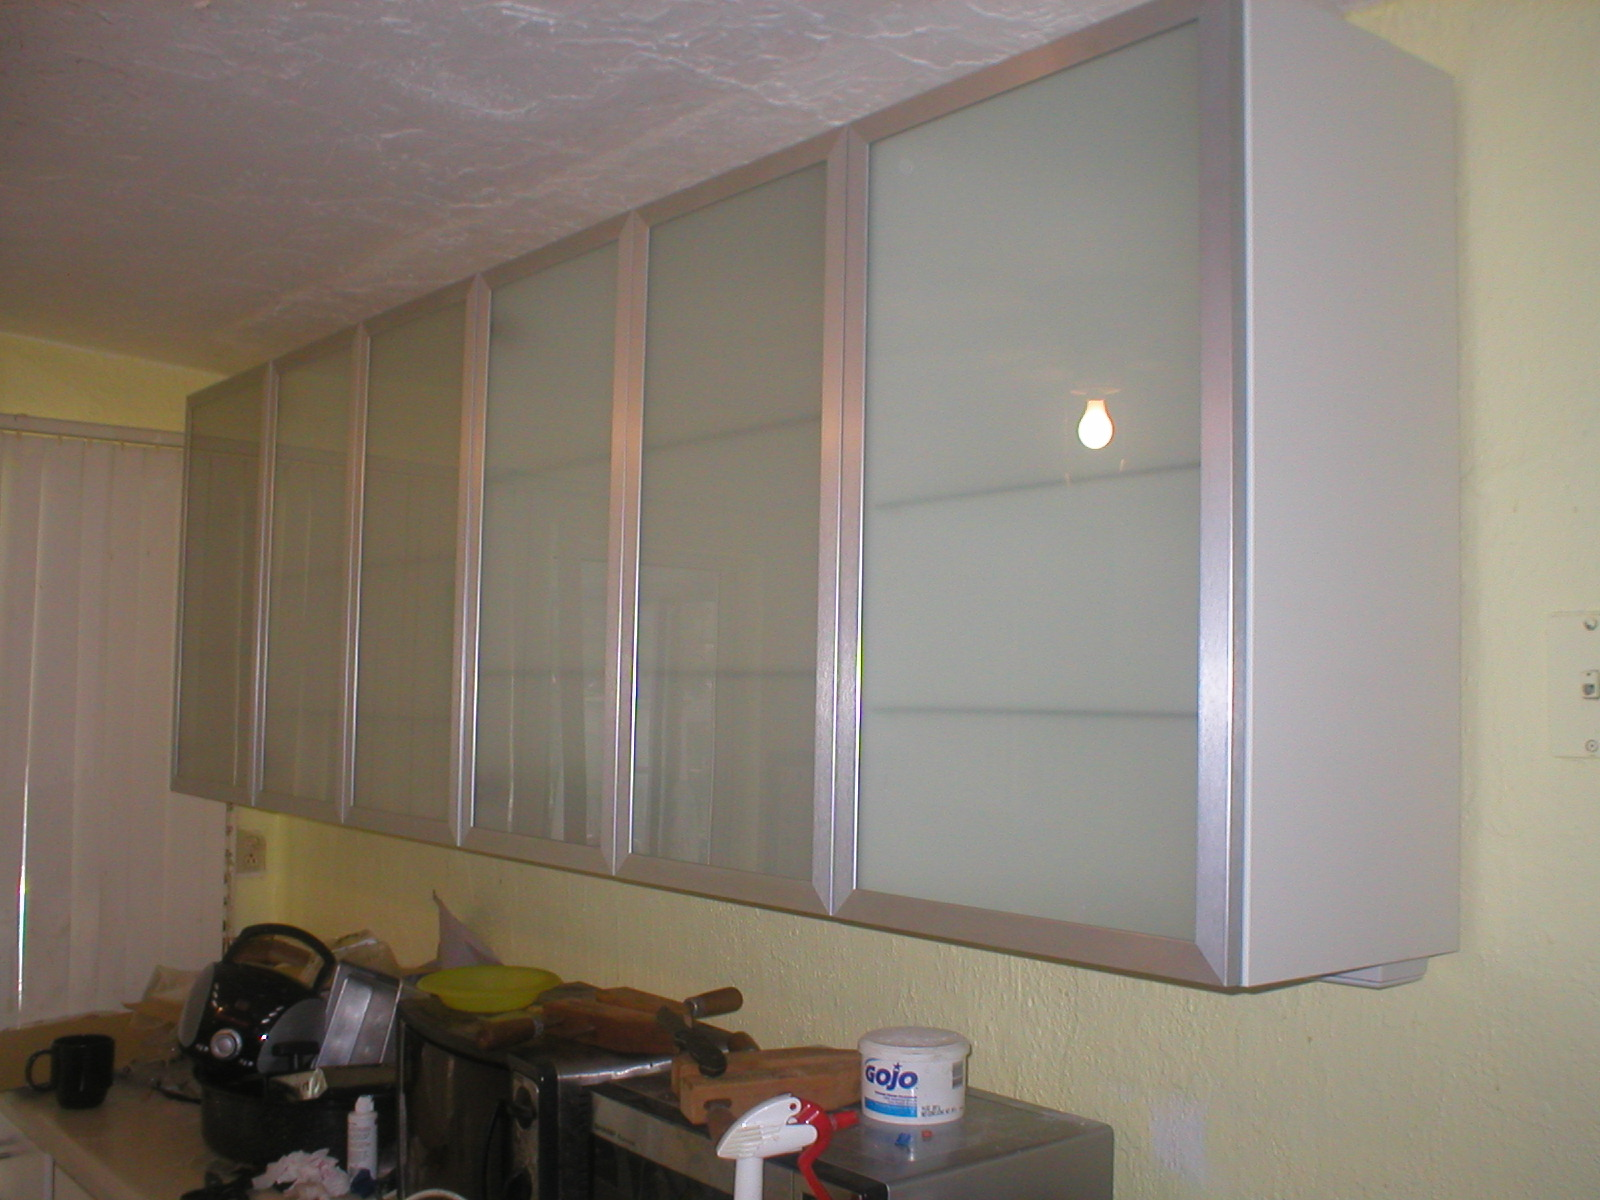 Installing Ikea Upper Kitchen Cabinets 5 Steps Instructables